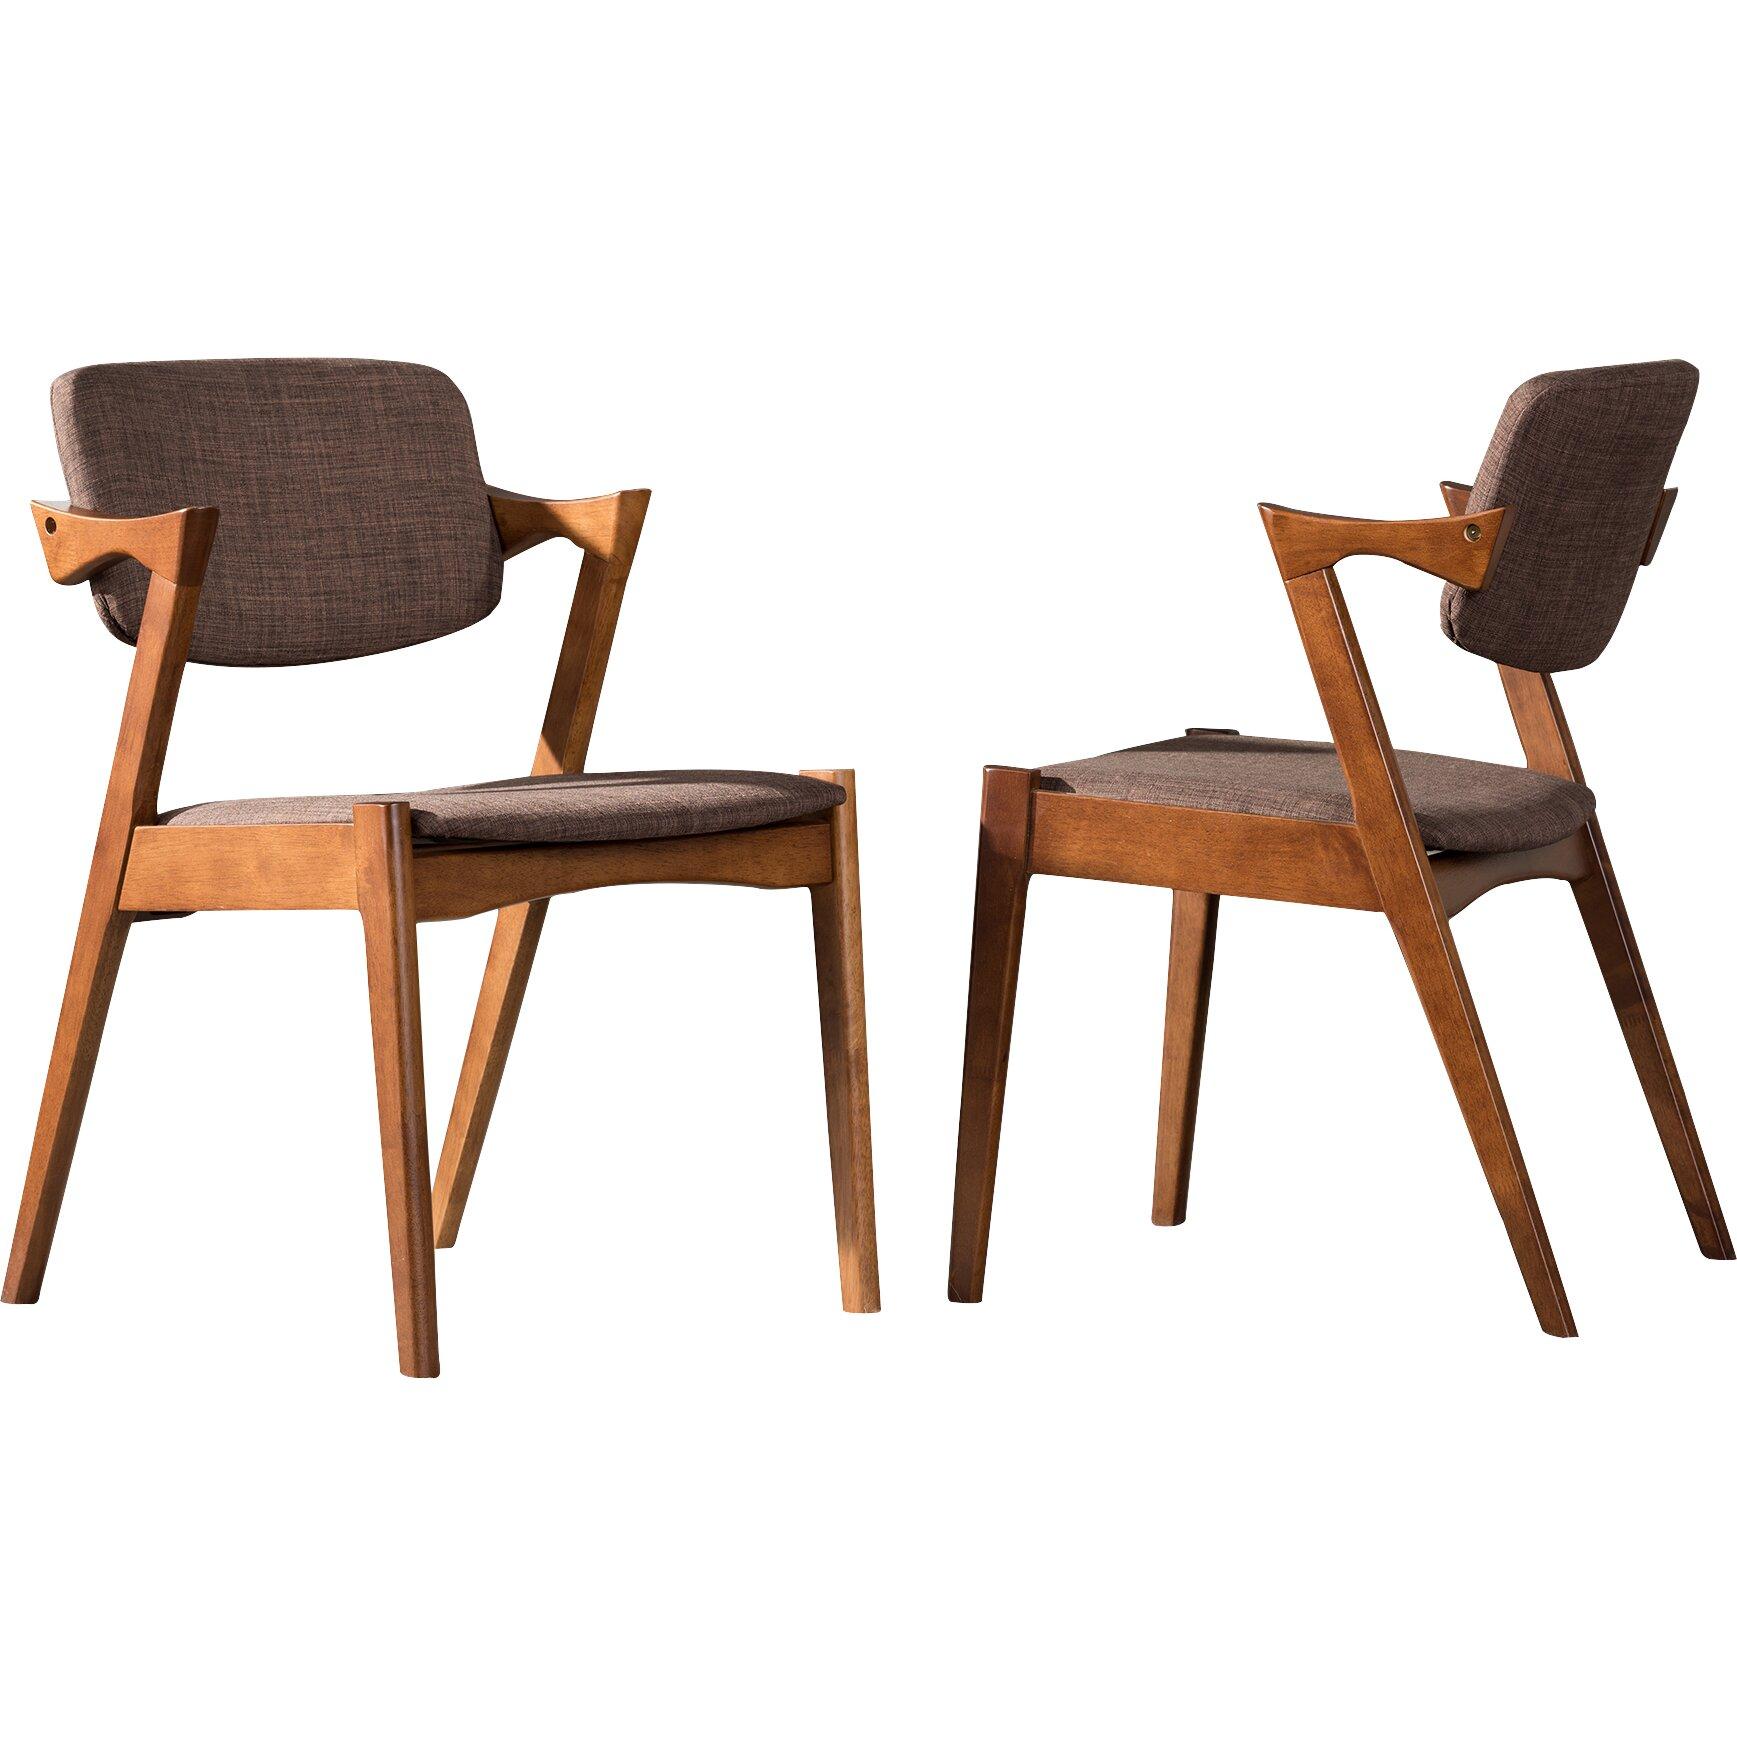 Wholesale interiors elegant upholstered side chair for Elegant upholstered dining chairs